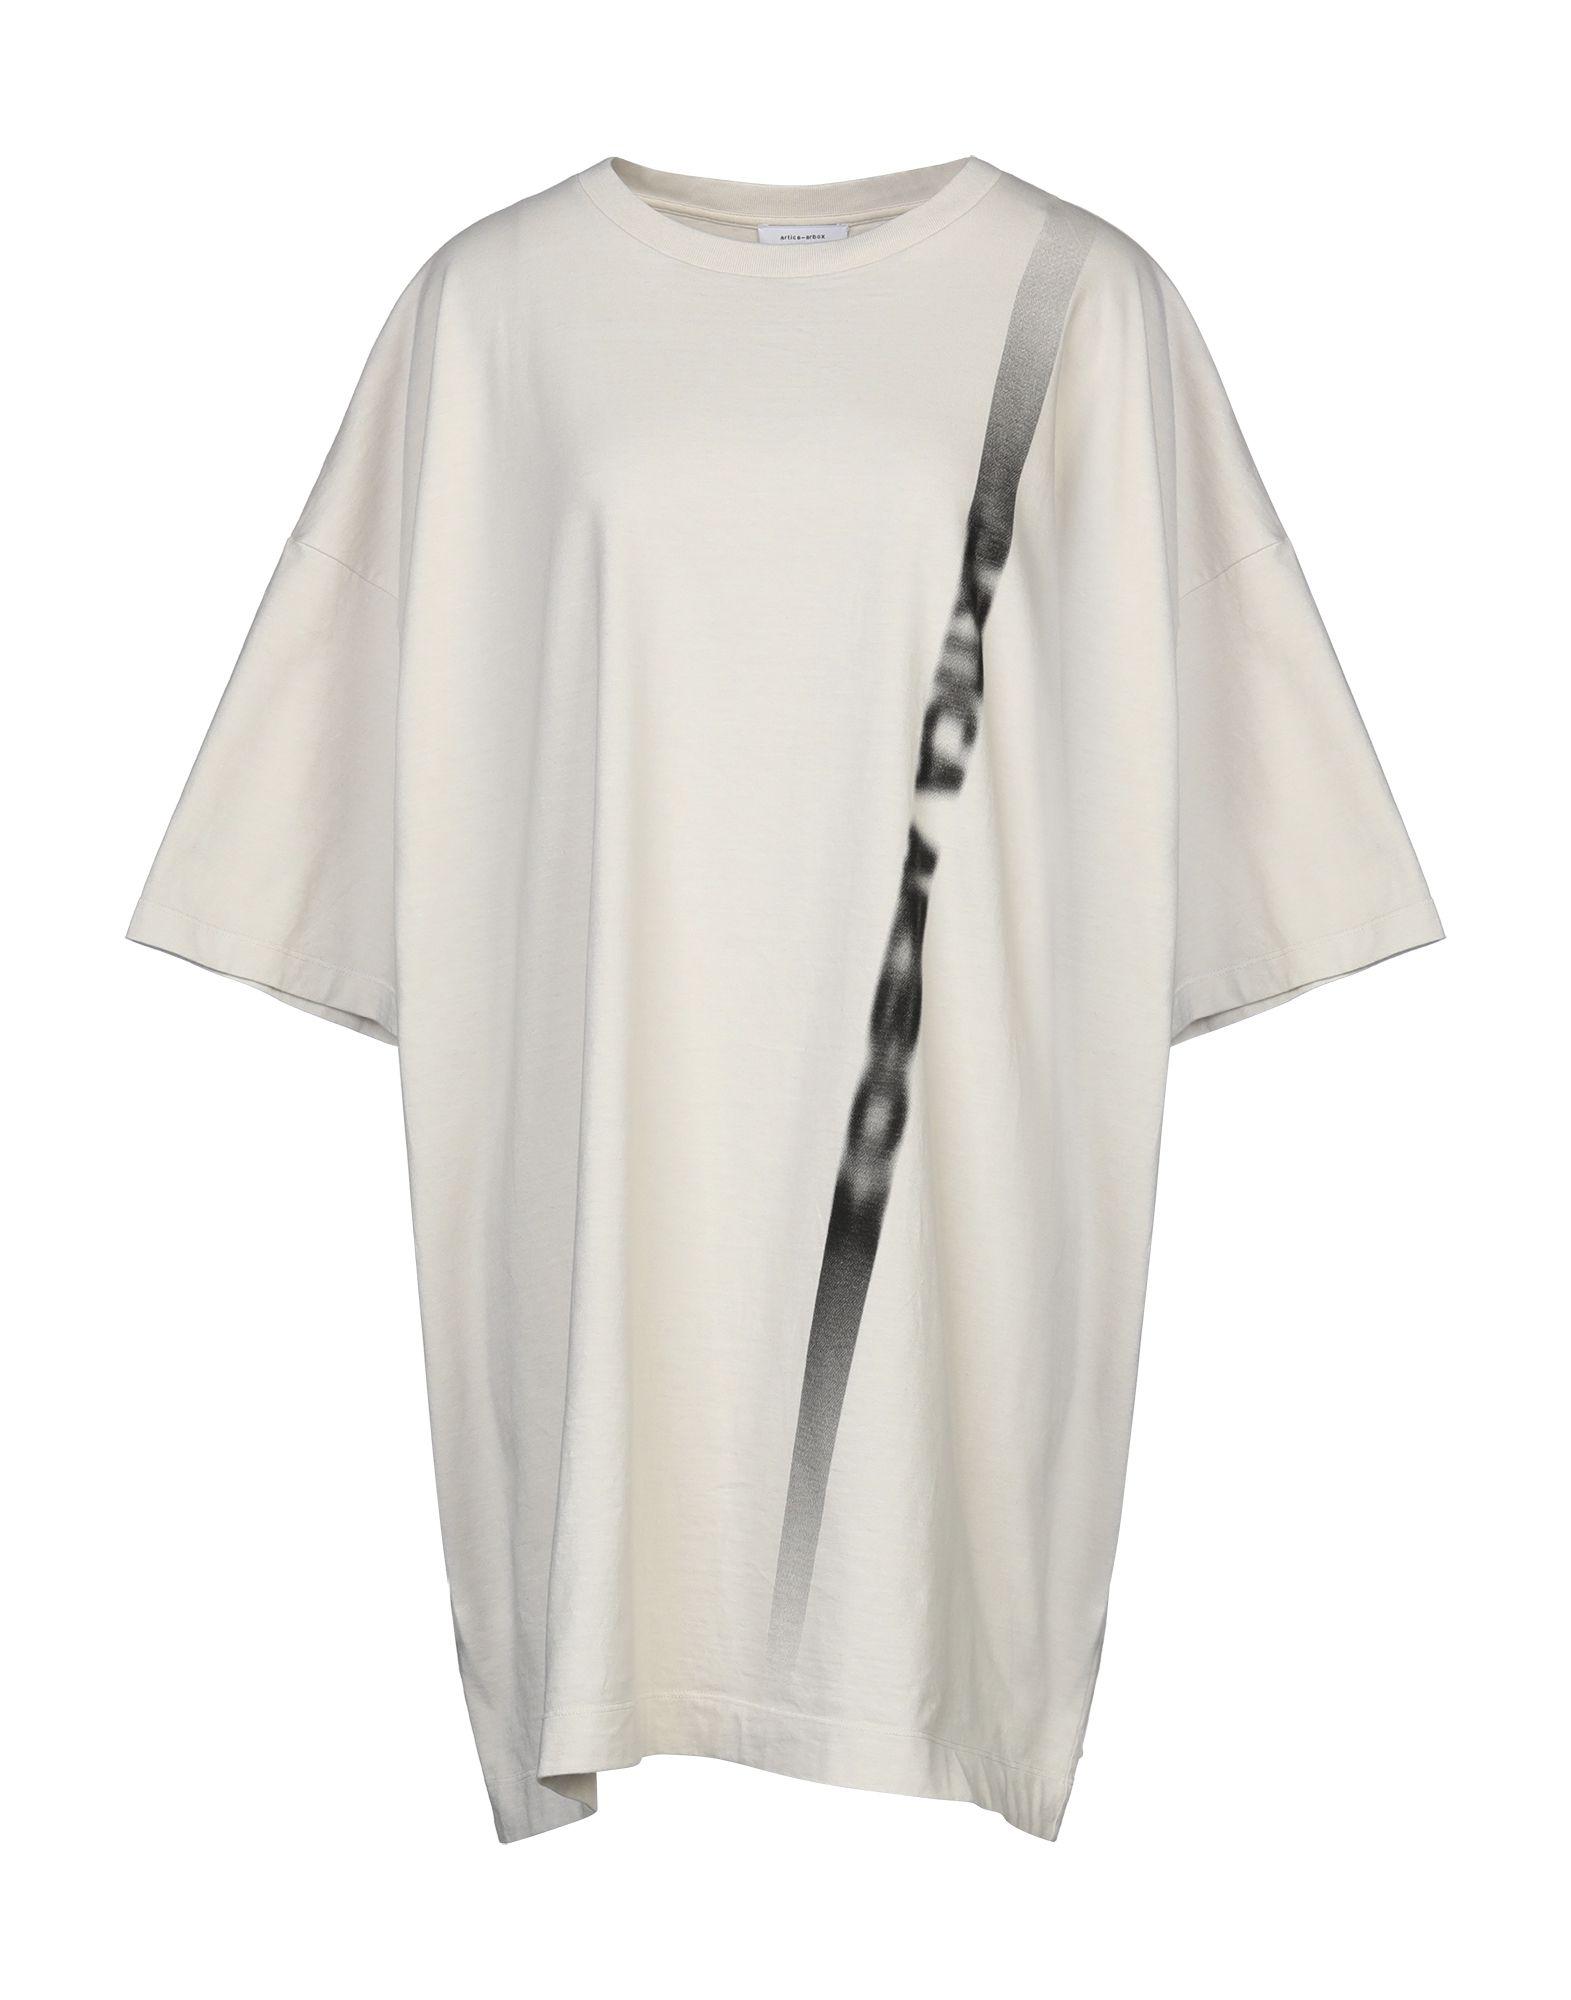 ARTICA-ARBOX Короткое платье фото